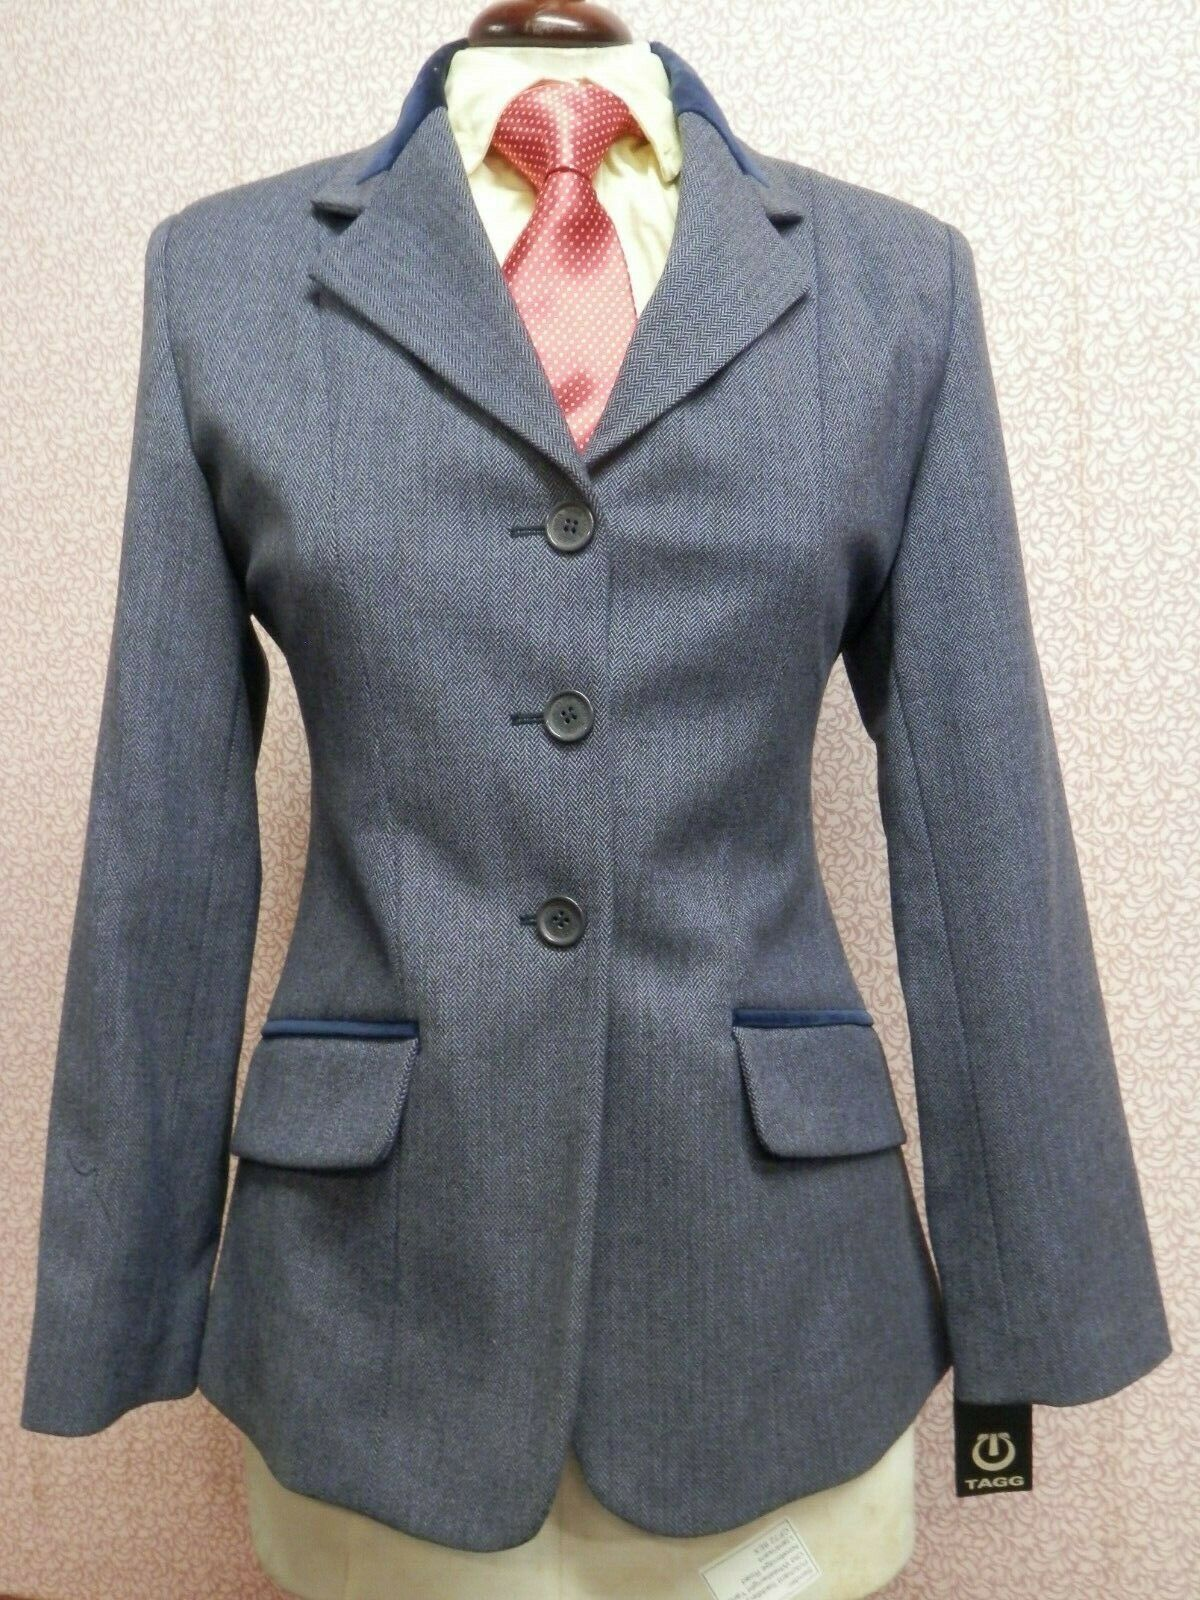 Tagg Maids Koln Rider Navy Tweed Show Jacket Größes  26,28,30,32